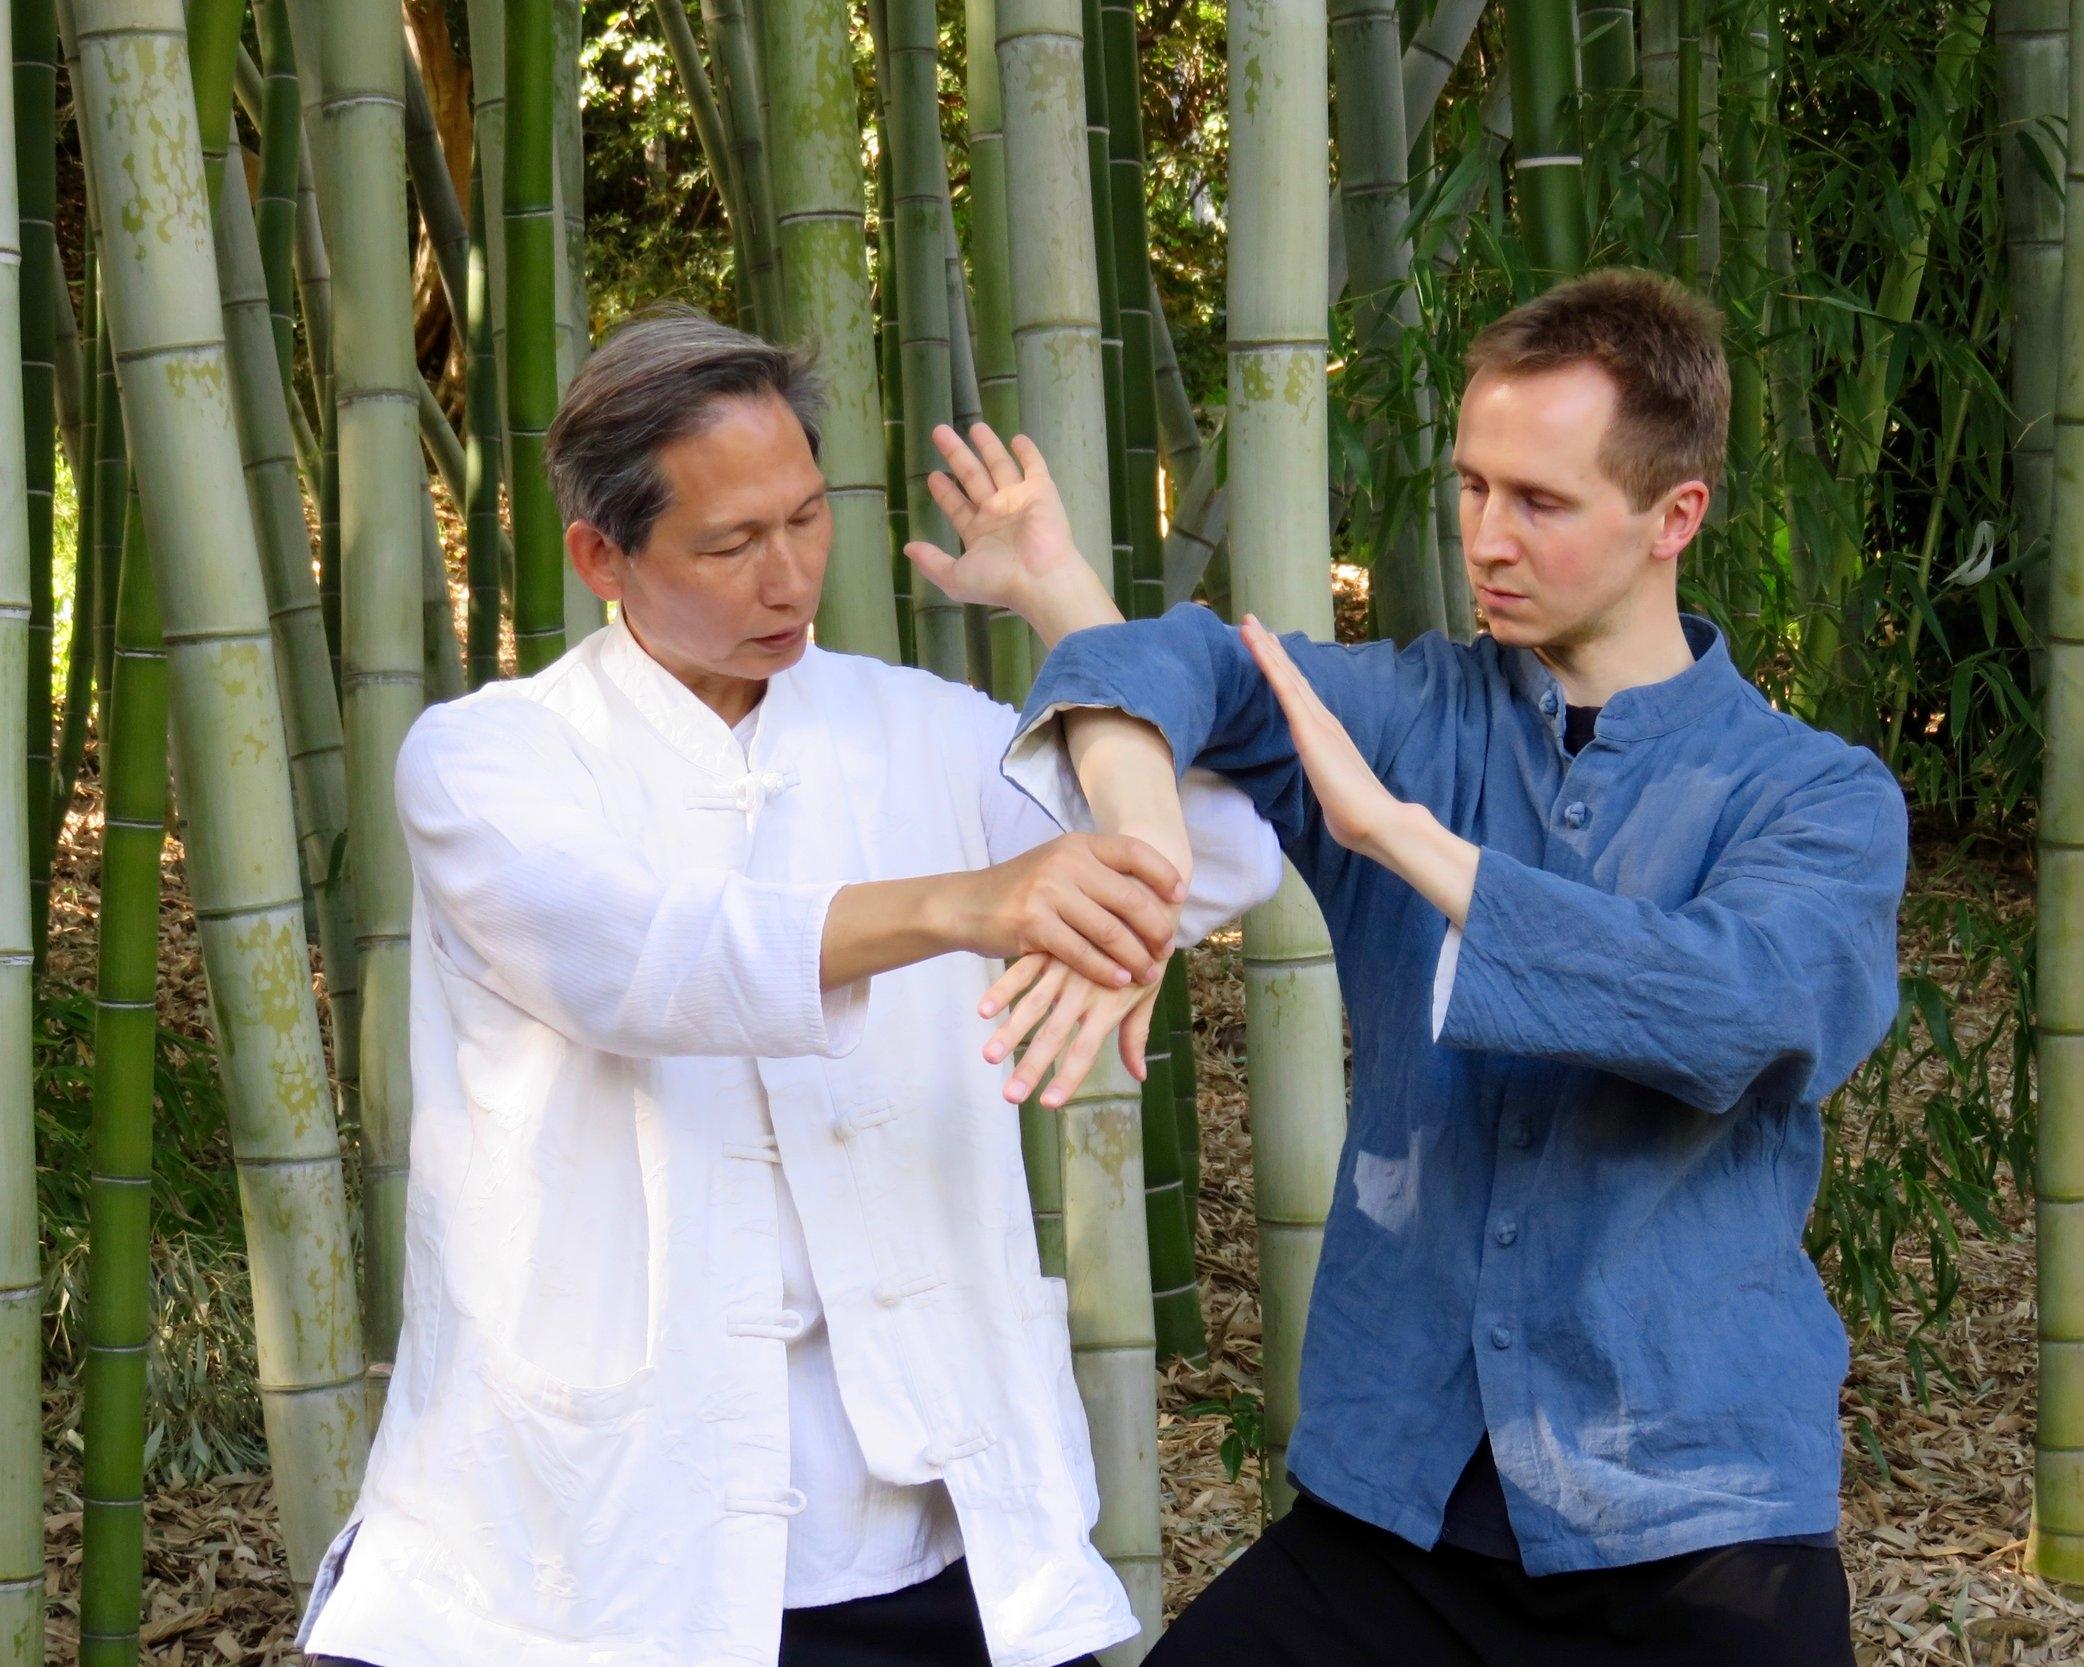 Master Tung, Kuan Yen (left) and Dr. Maarten Vercruysse, The Huntington botanical garden, Los Angeles 2017